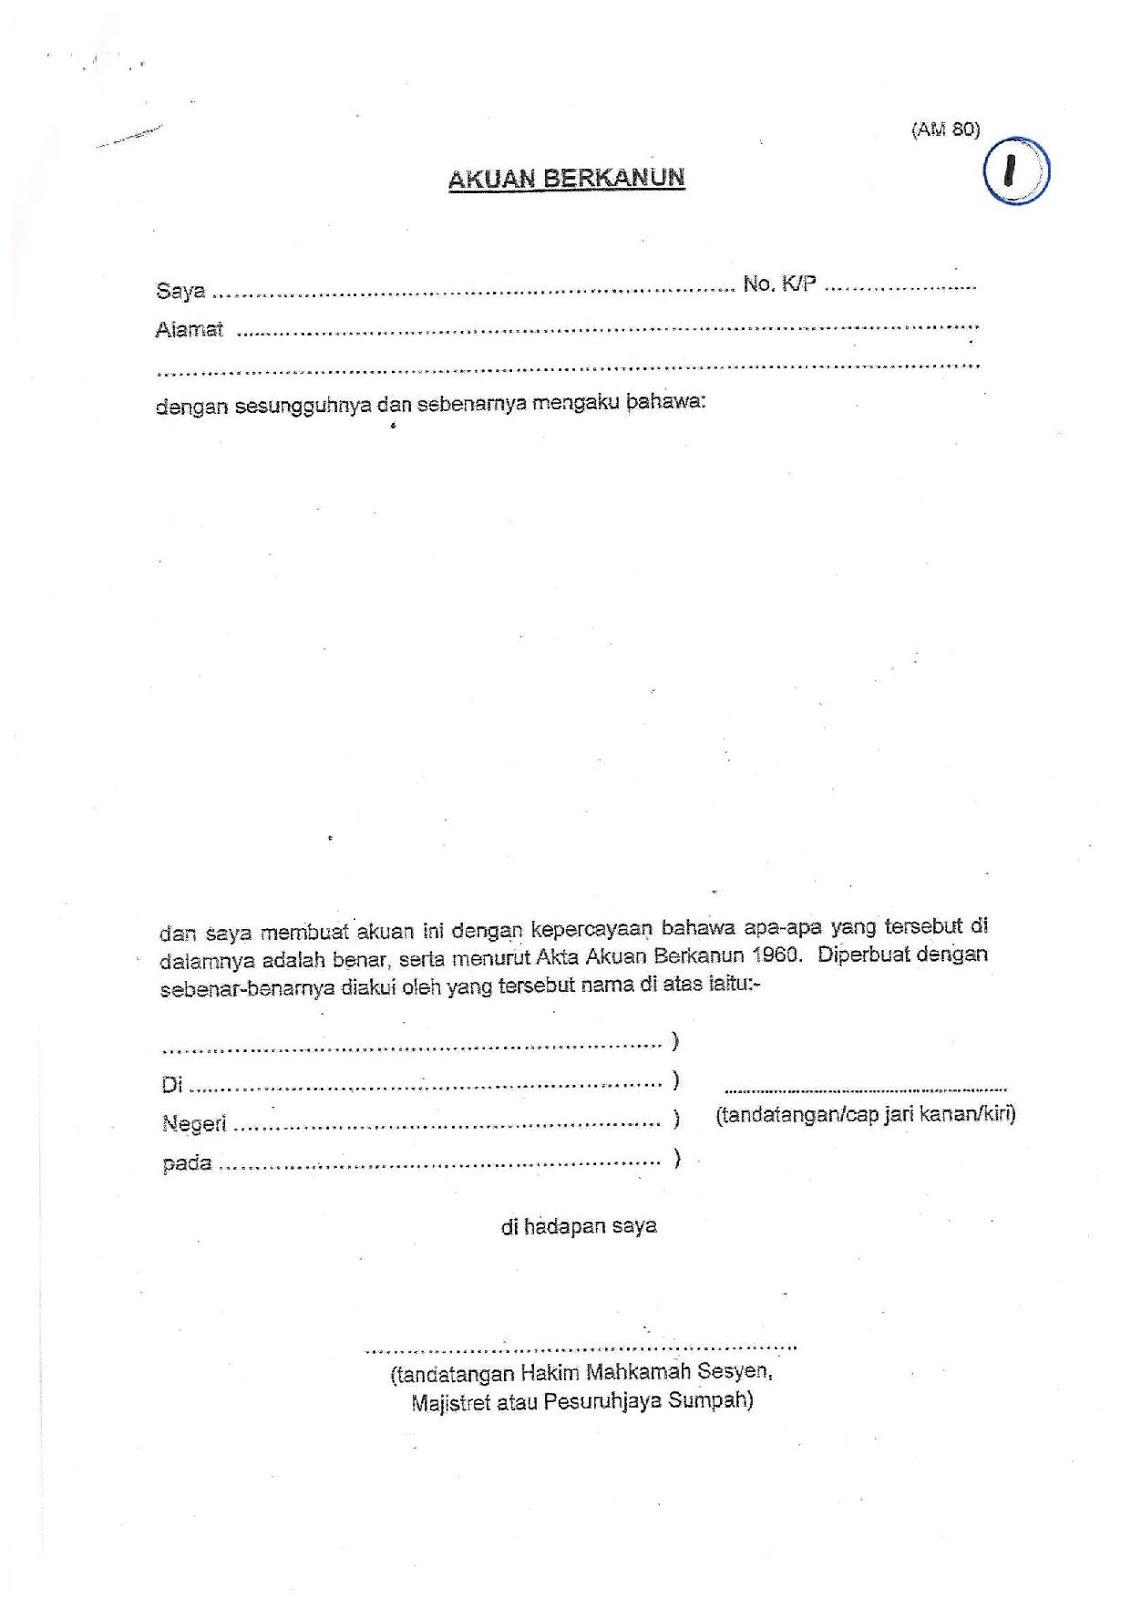 Contoh Soal To Kimia Contoh Surat Akuan Sumpah